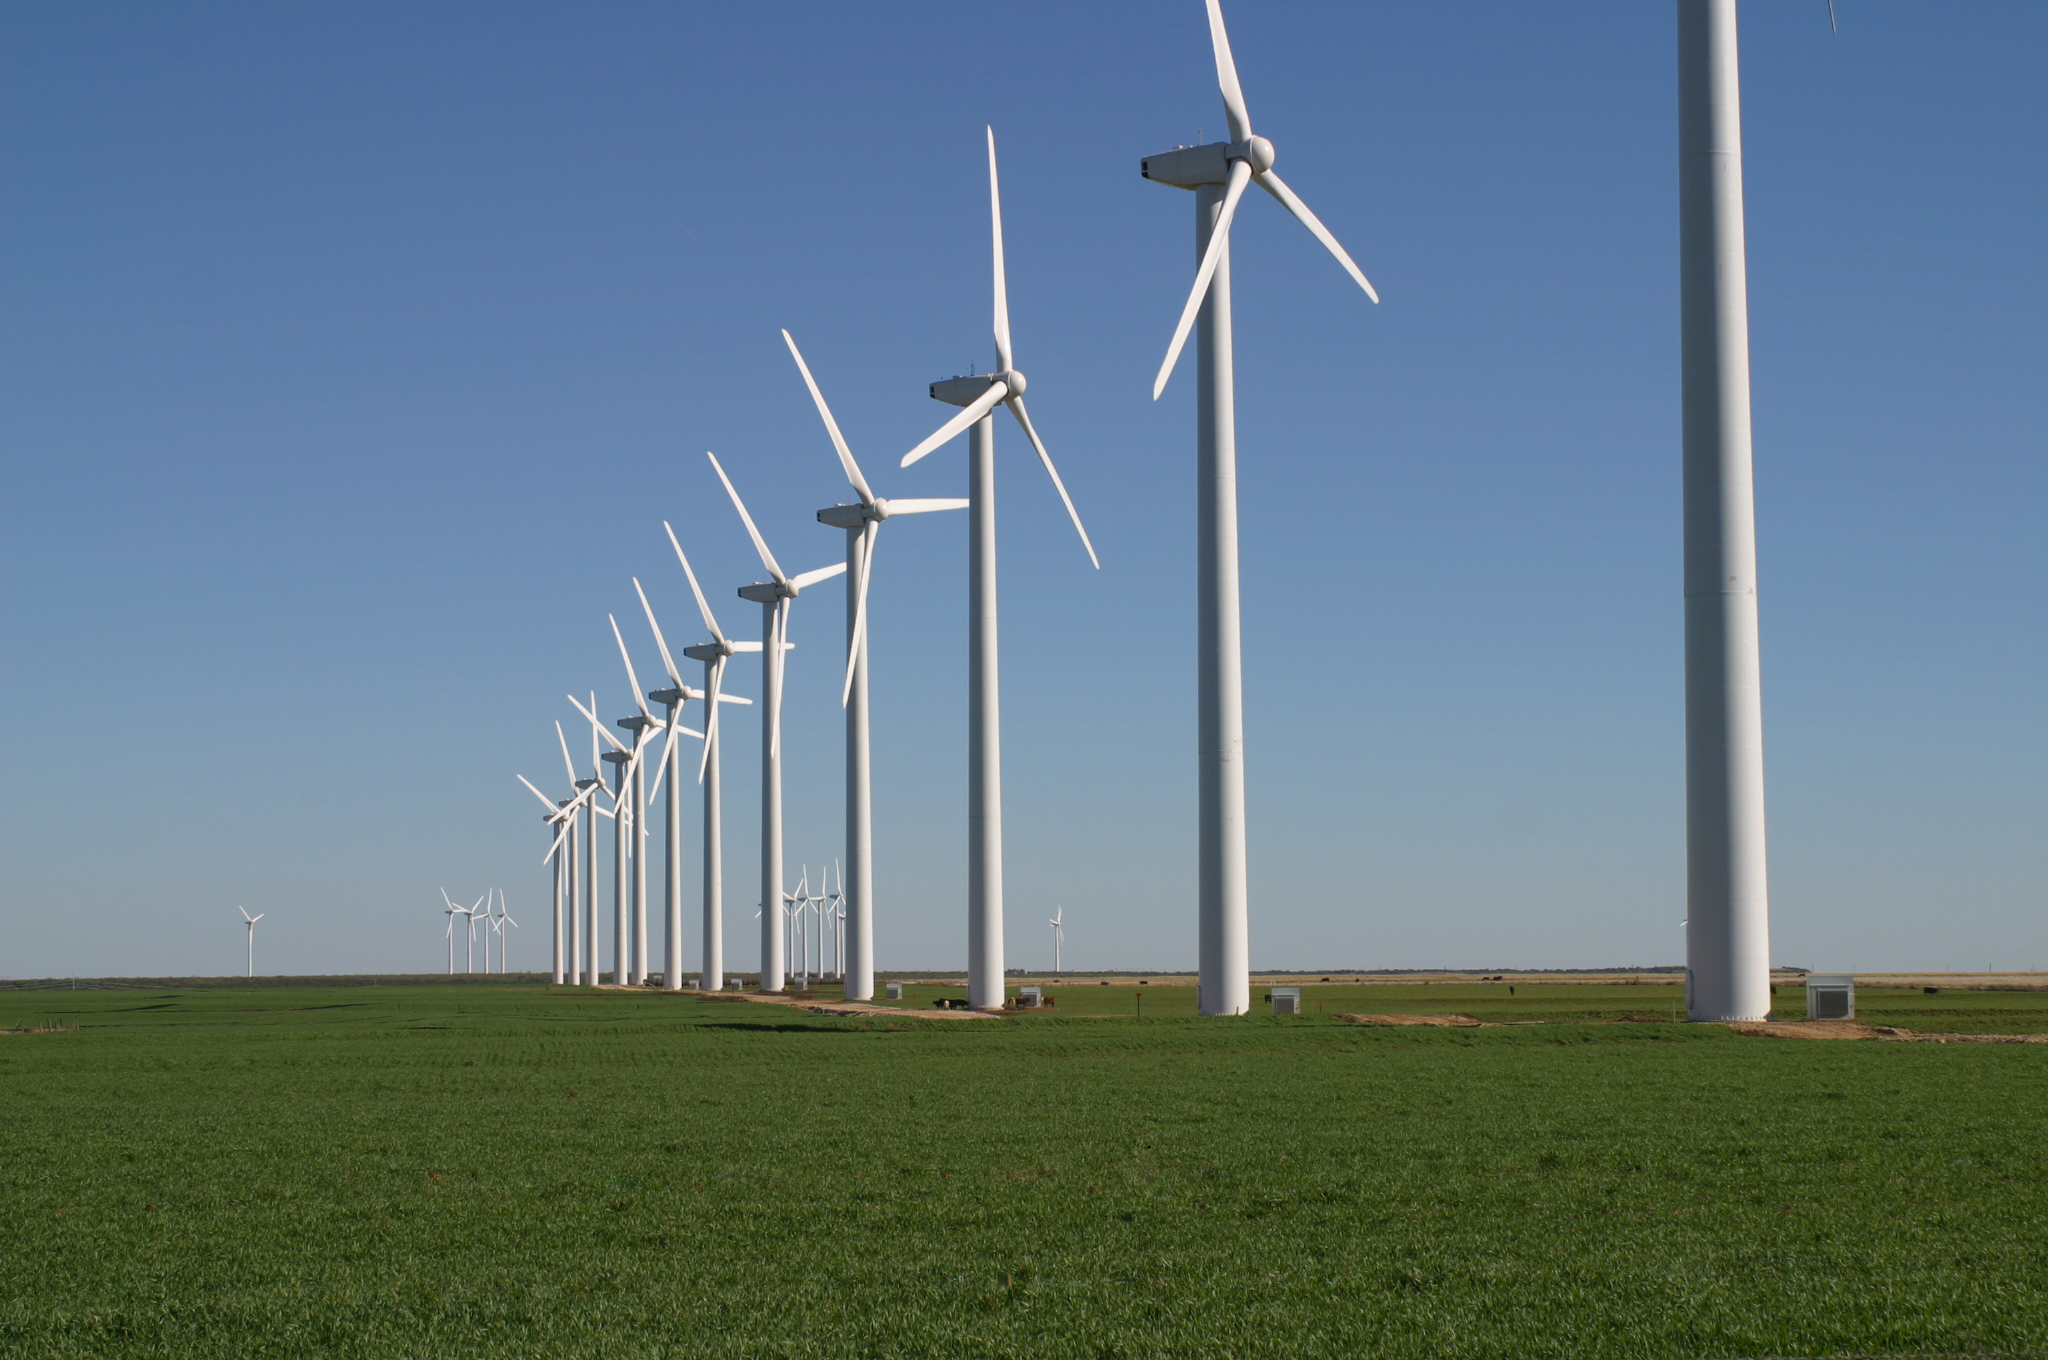 emergence of Wind Power